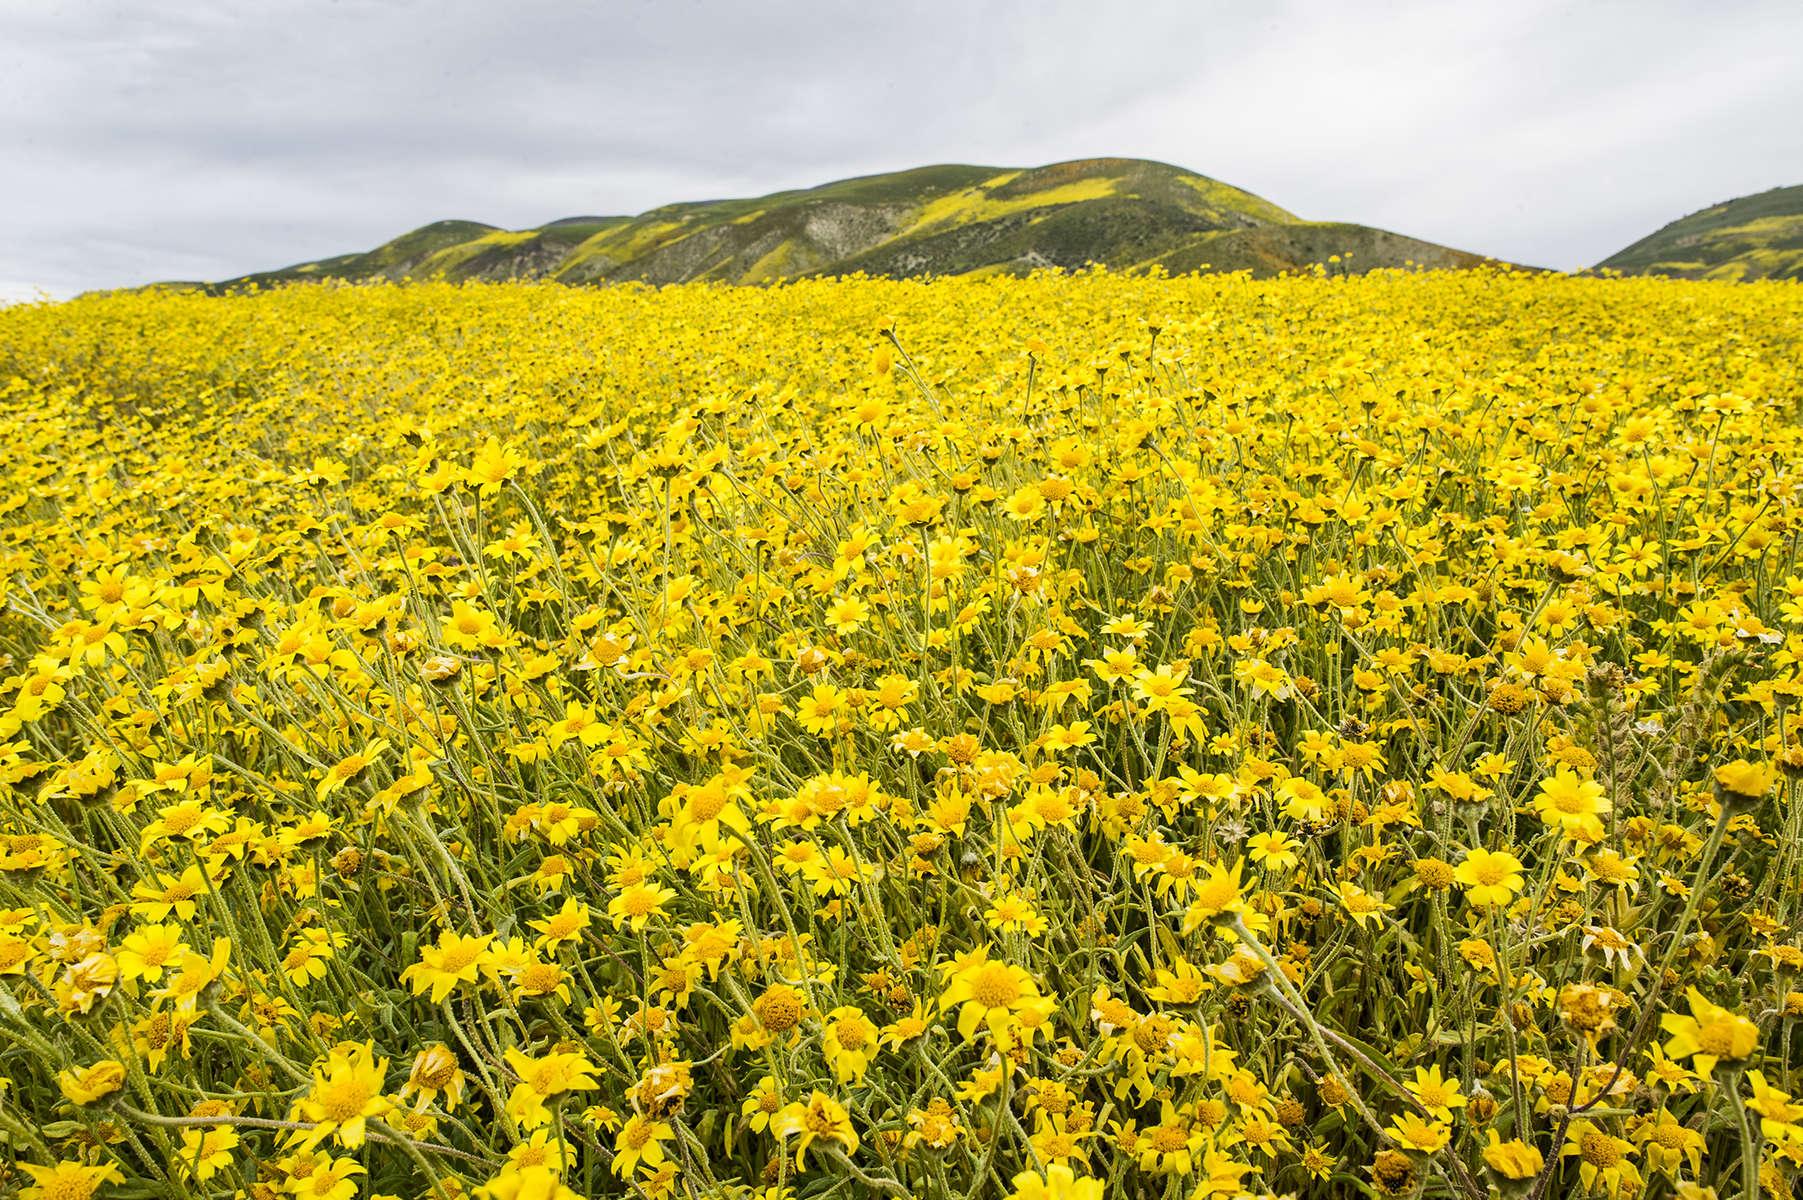 Hillside Daisies bloom in California's Carrizo Plain National Monument, April 2017.